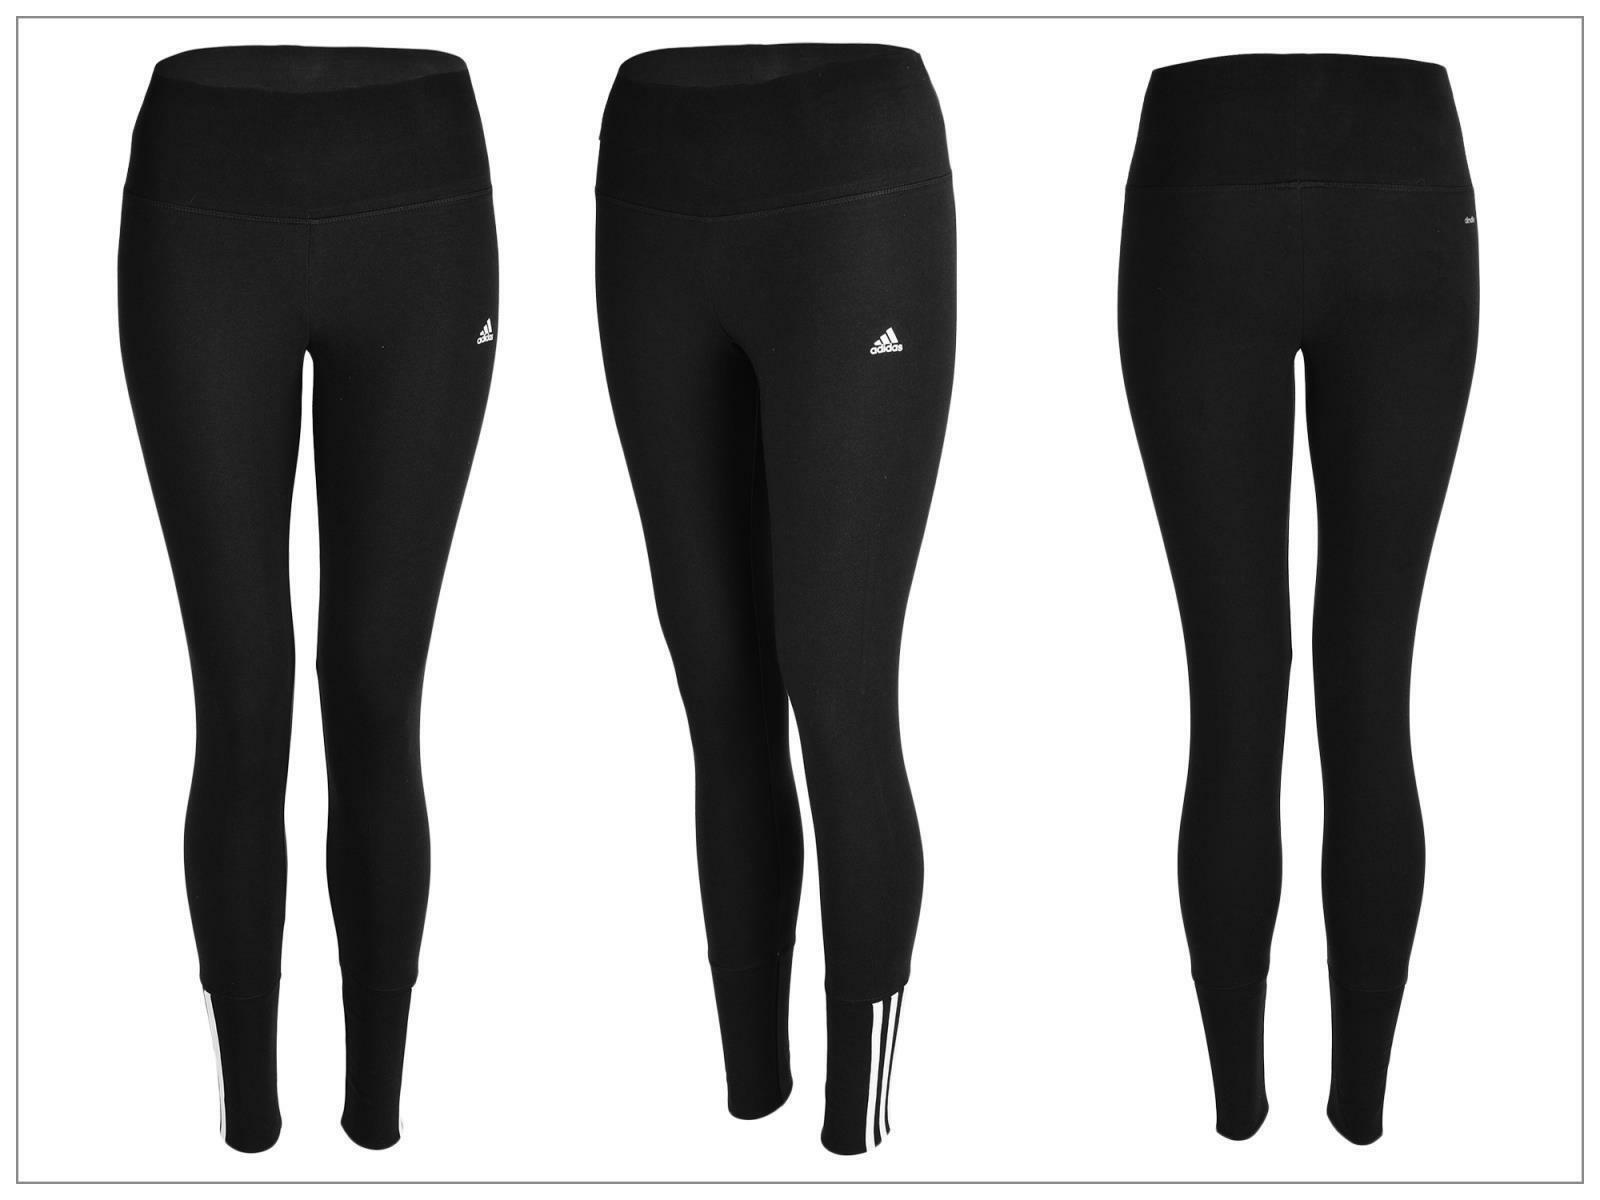 adidas adidas essential mid 3s tights pantaloni aderenti jogging donna neri s18820